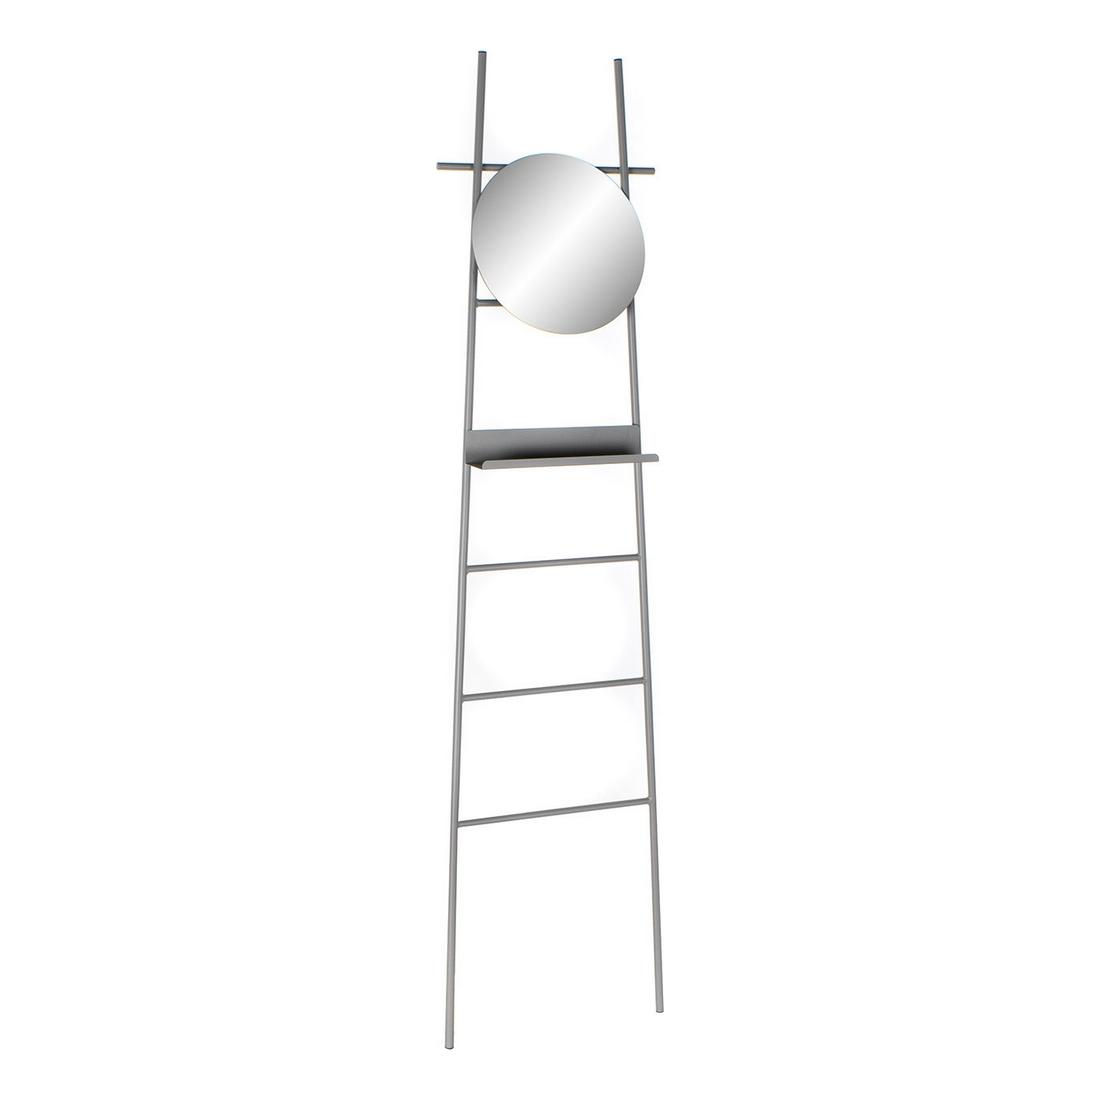 Free-Standing Towel Rack DKD Home Decor Grey Metal Mirror (46 x 10 x 180 cm)